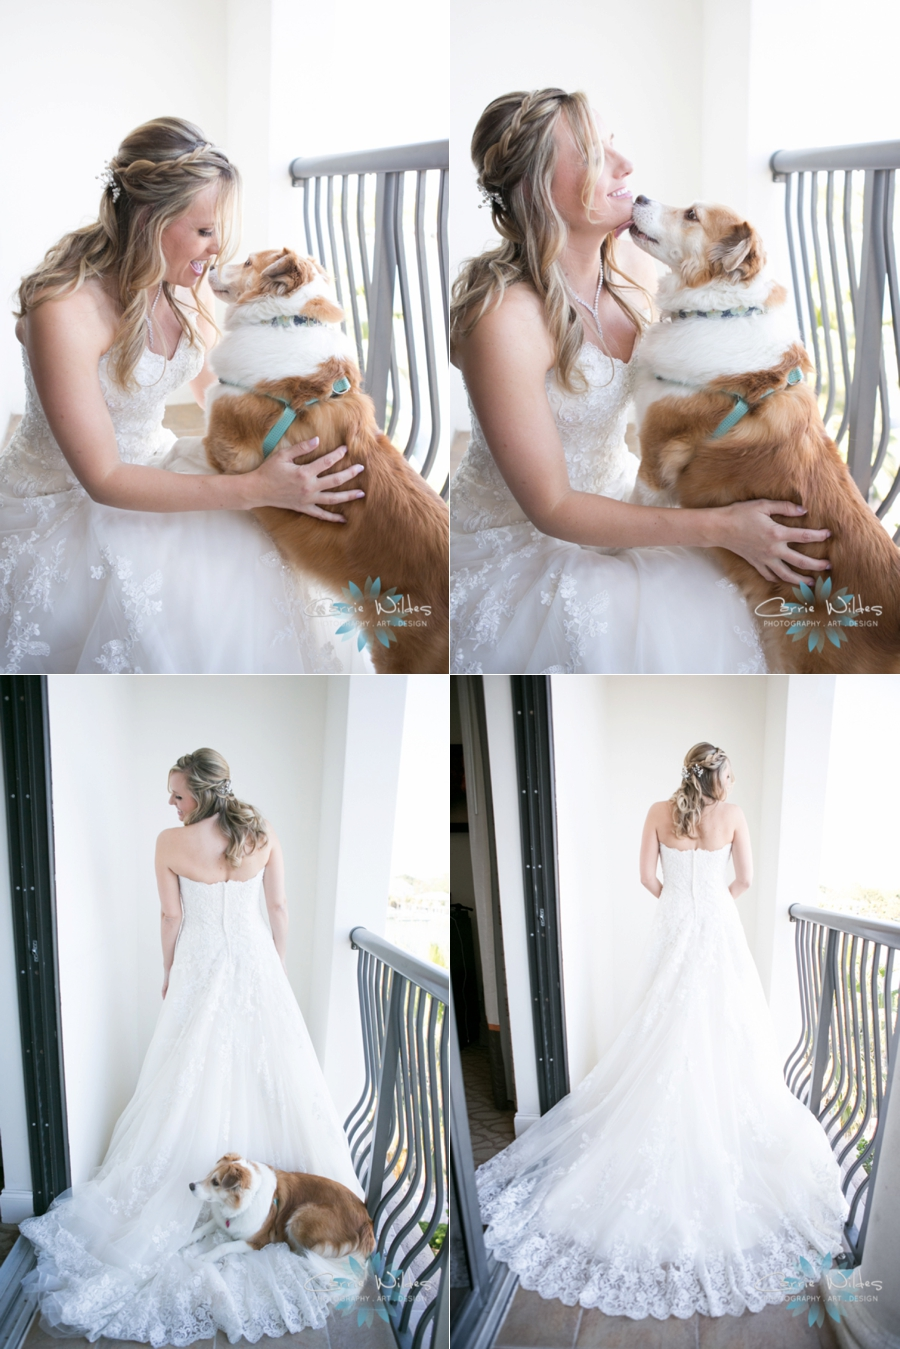 3_24_18 Kristin and Daniel Hotel Zamora Wedding_0017.jpg